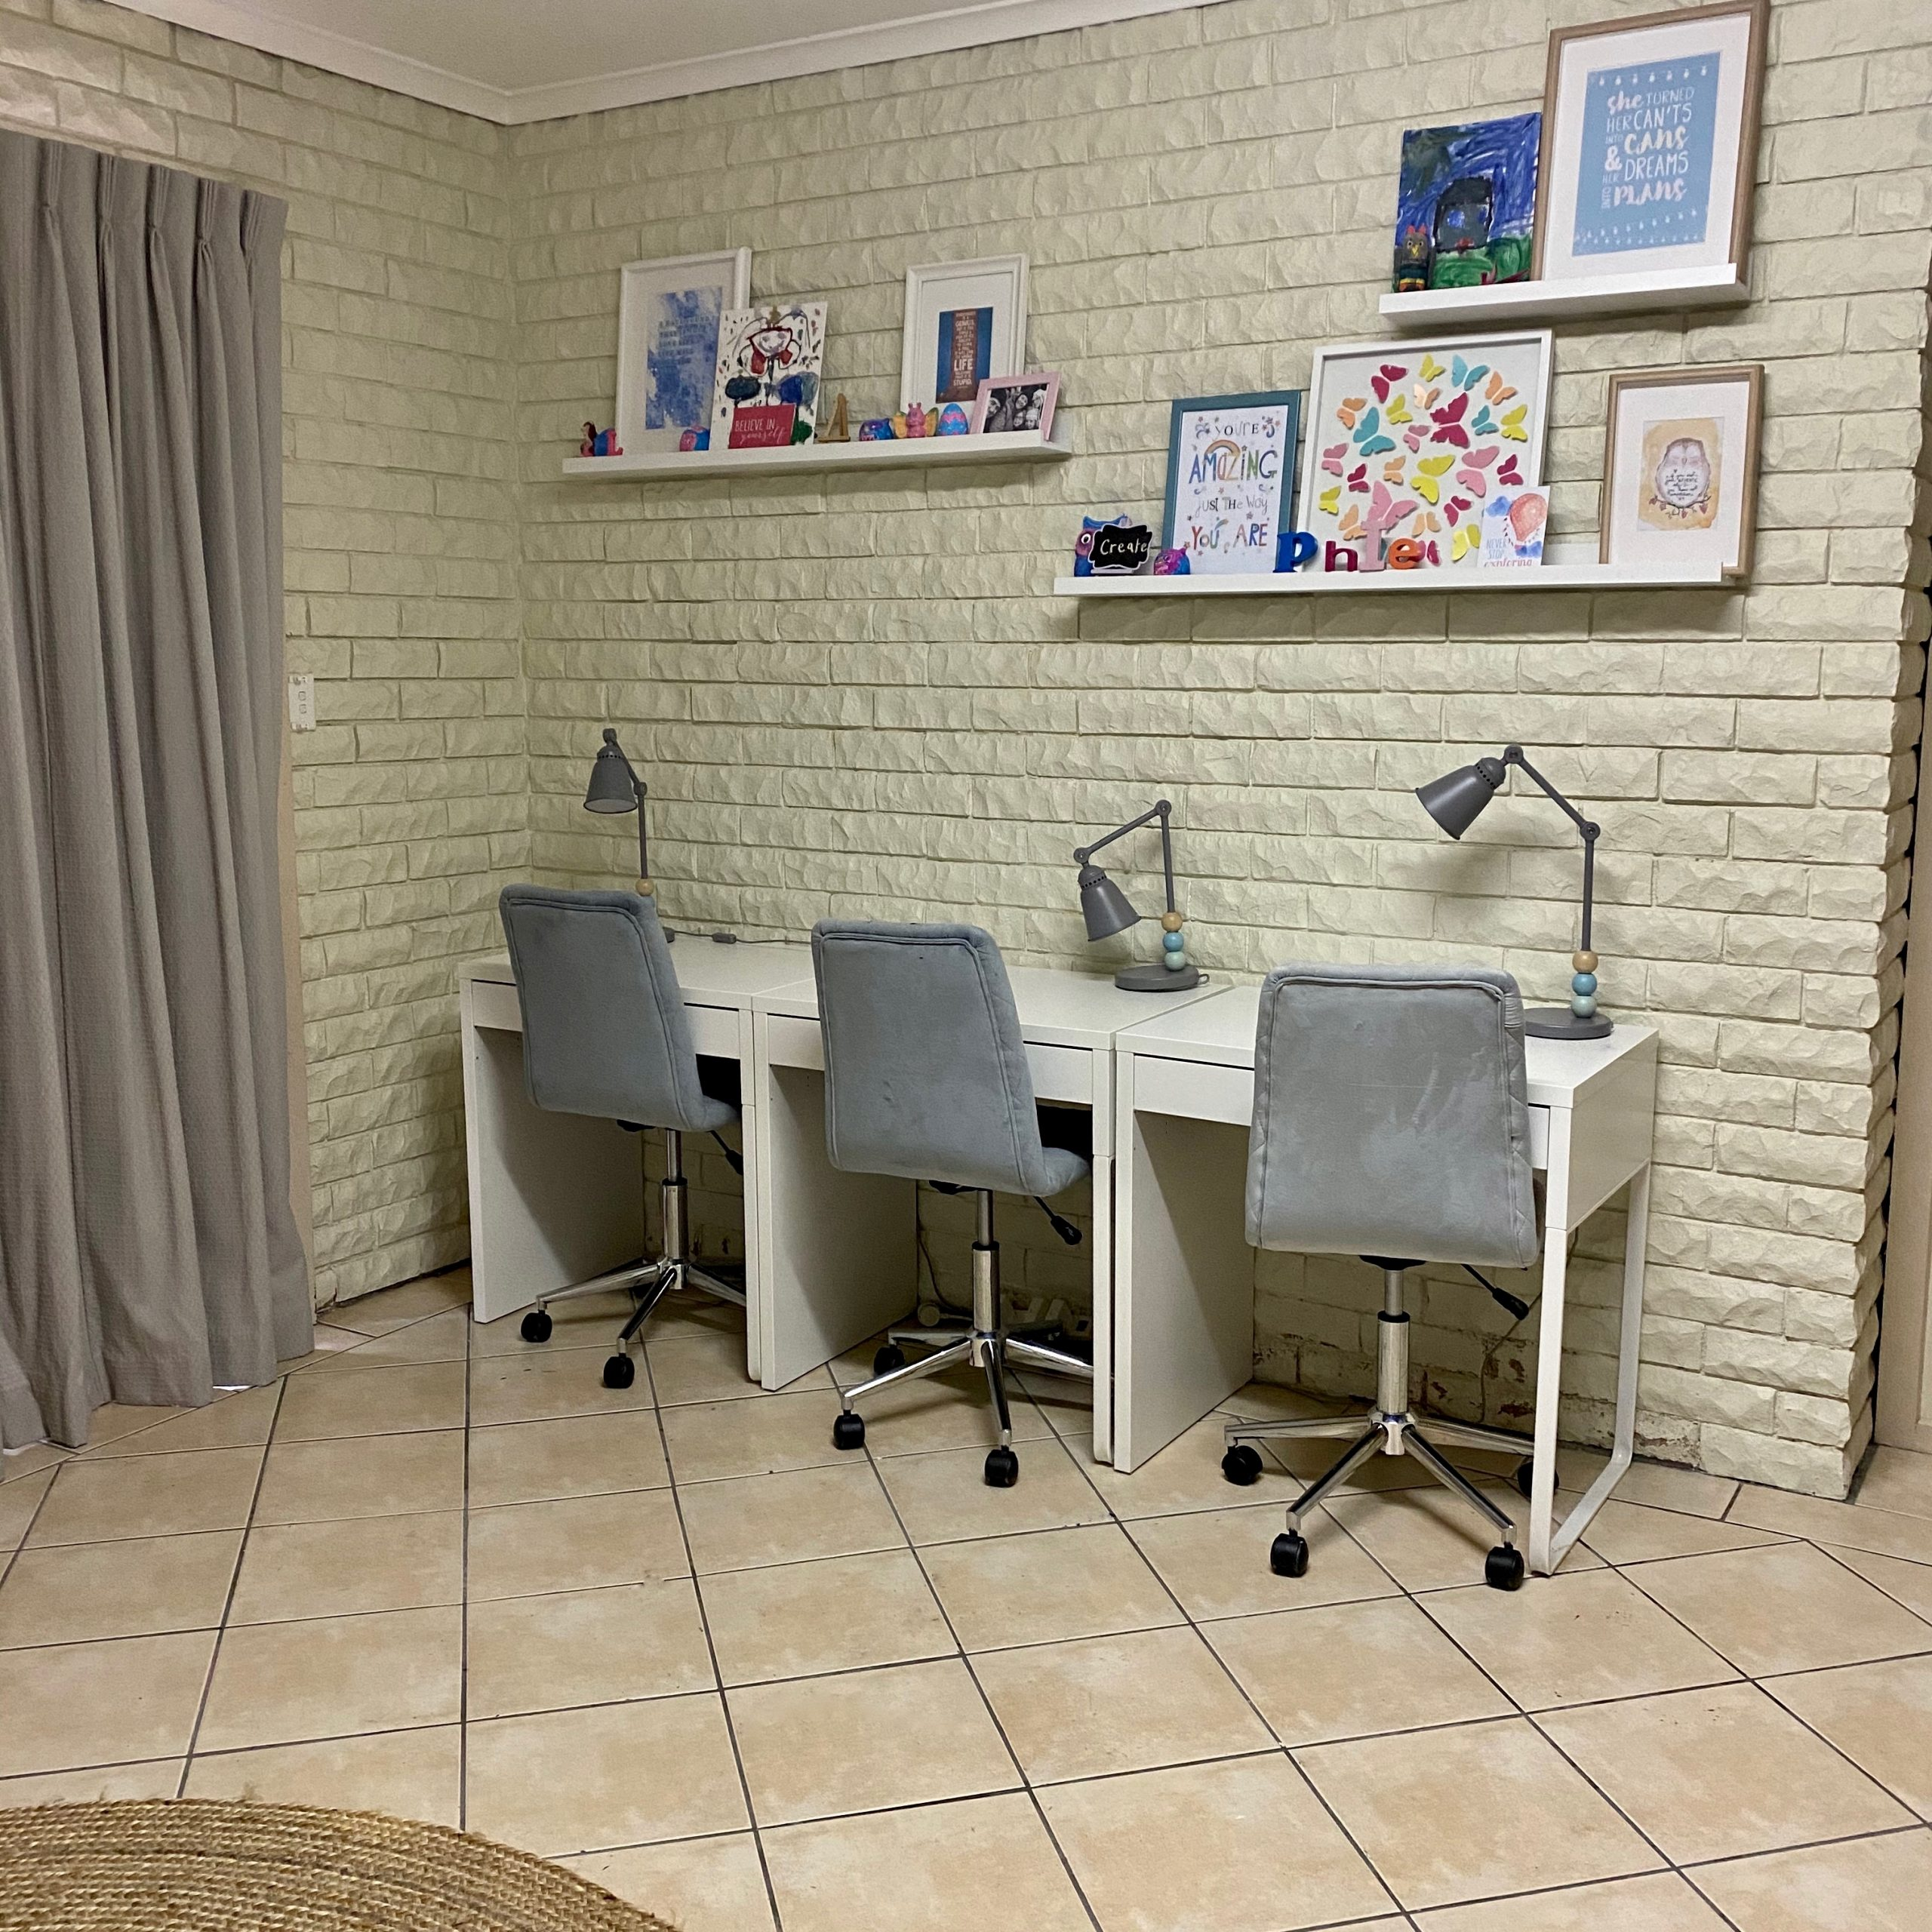 Children's Study Desks After Organisation - The Organising Bee Canberra